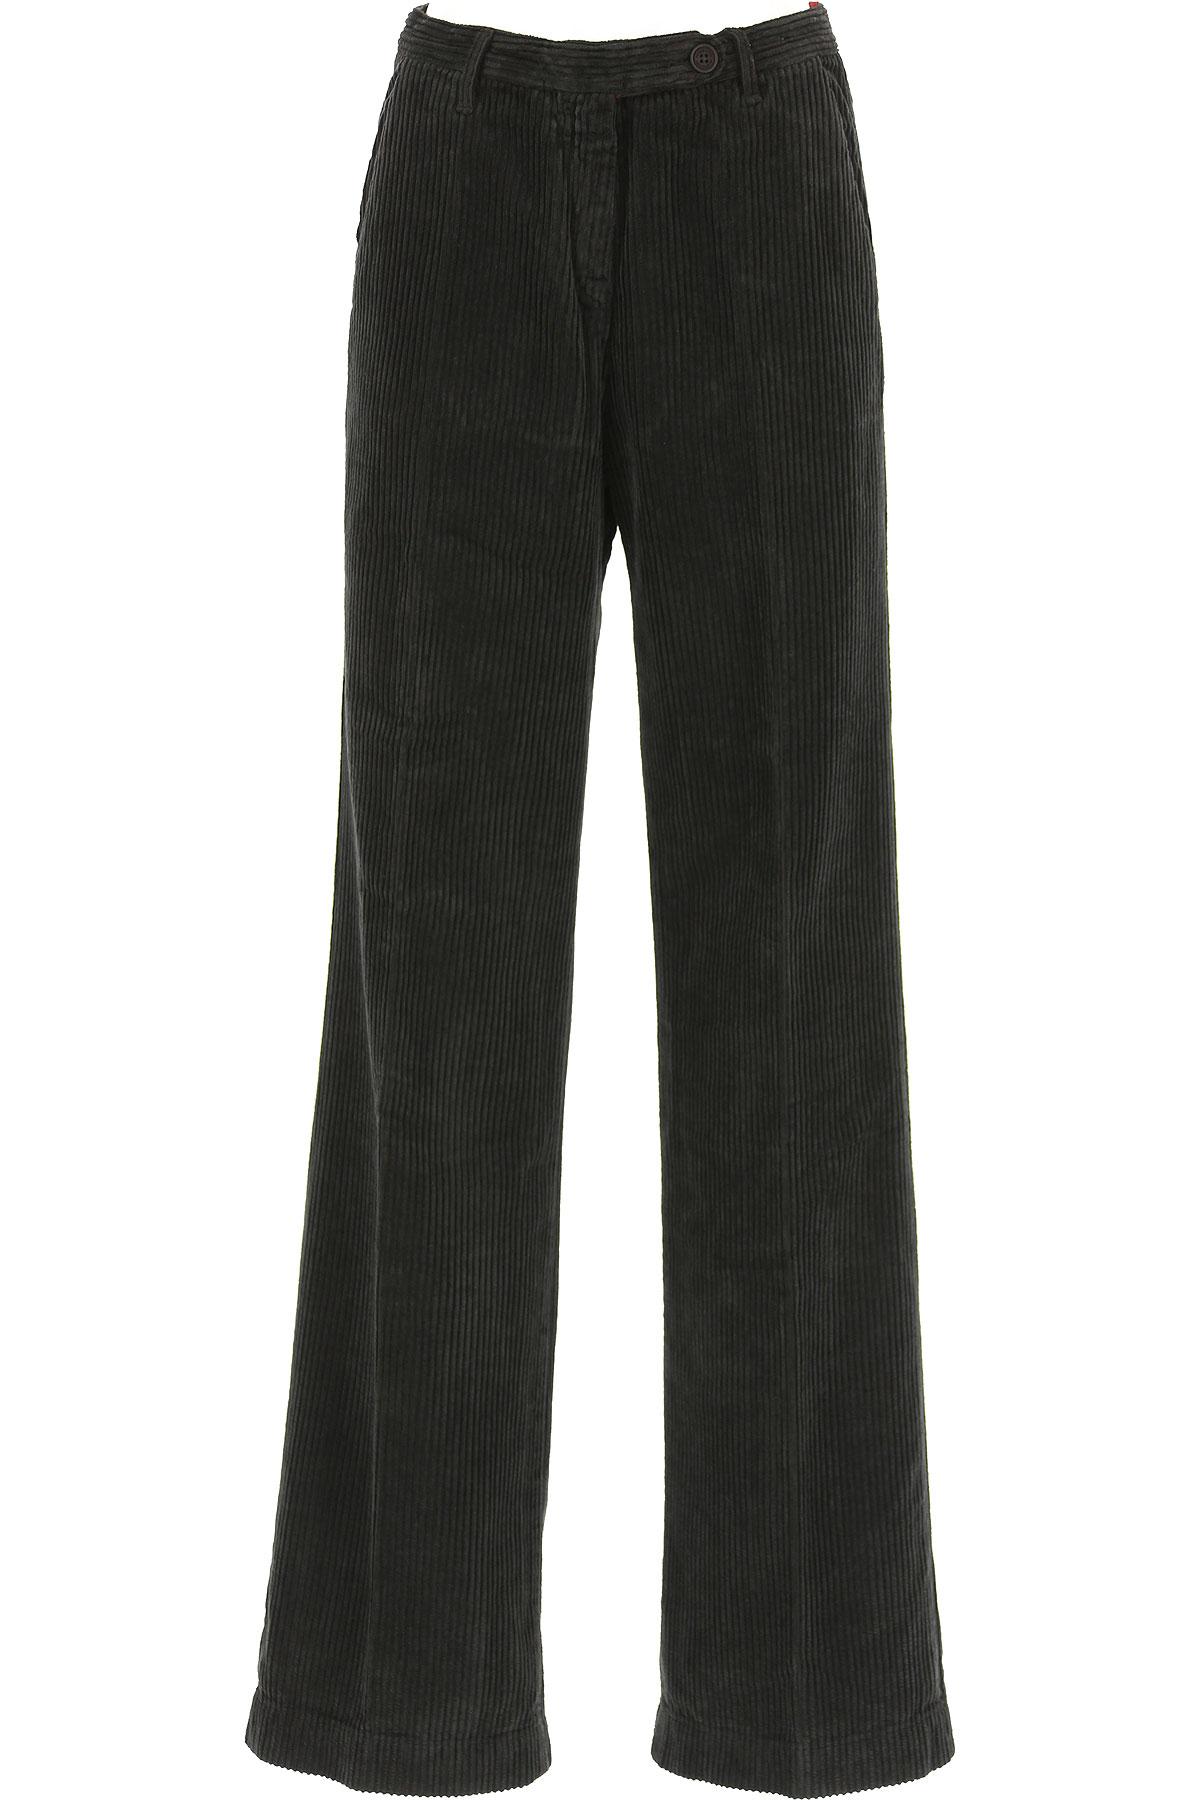 Image of Massimo Alba Pants for Women, Black, Cotton, 2017, 24 26 28 30